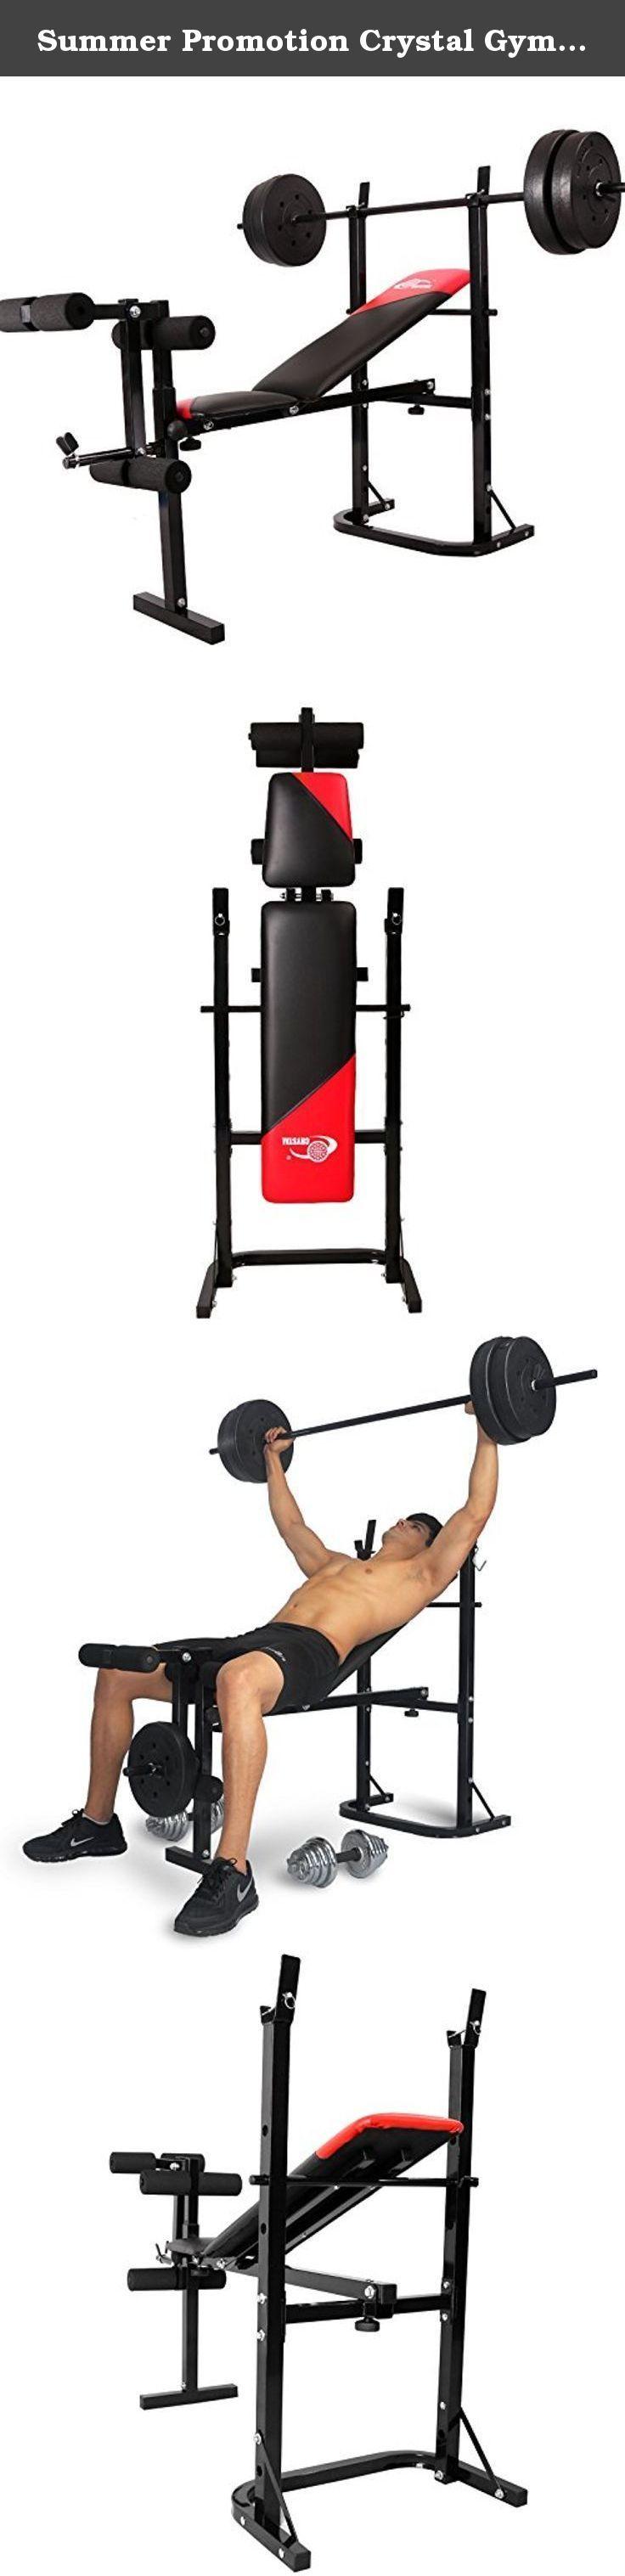 Summer Promotion Crystal Gym Equipment Weight Lifting Bench Leg Press Machine Body Building Exercise Bench-40kg. Material:Steel & Sponge & PE Plastic Back cushion:EPE Sponge Main Tube:Dia 38MM Colour:In option Max Load weight:250KG Qty/ctn:1PC/cnt Dimension:L142*W57*H107cm Carton Size:L109*W45*H10cm G.W/N.W :15/ 17 kgs Container: 600 PCS/20GP 1245 PCS/40GP 1405 PCS/40HQ MOQ:1 PCS .